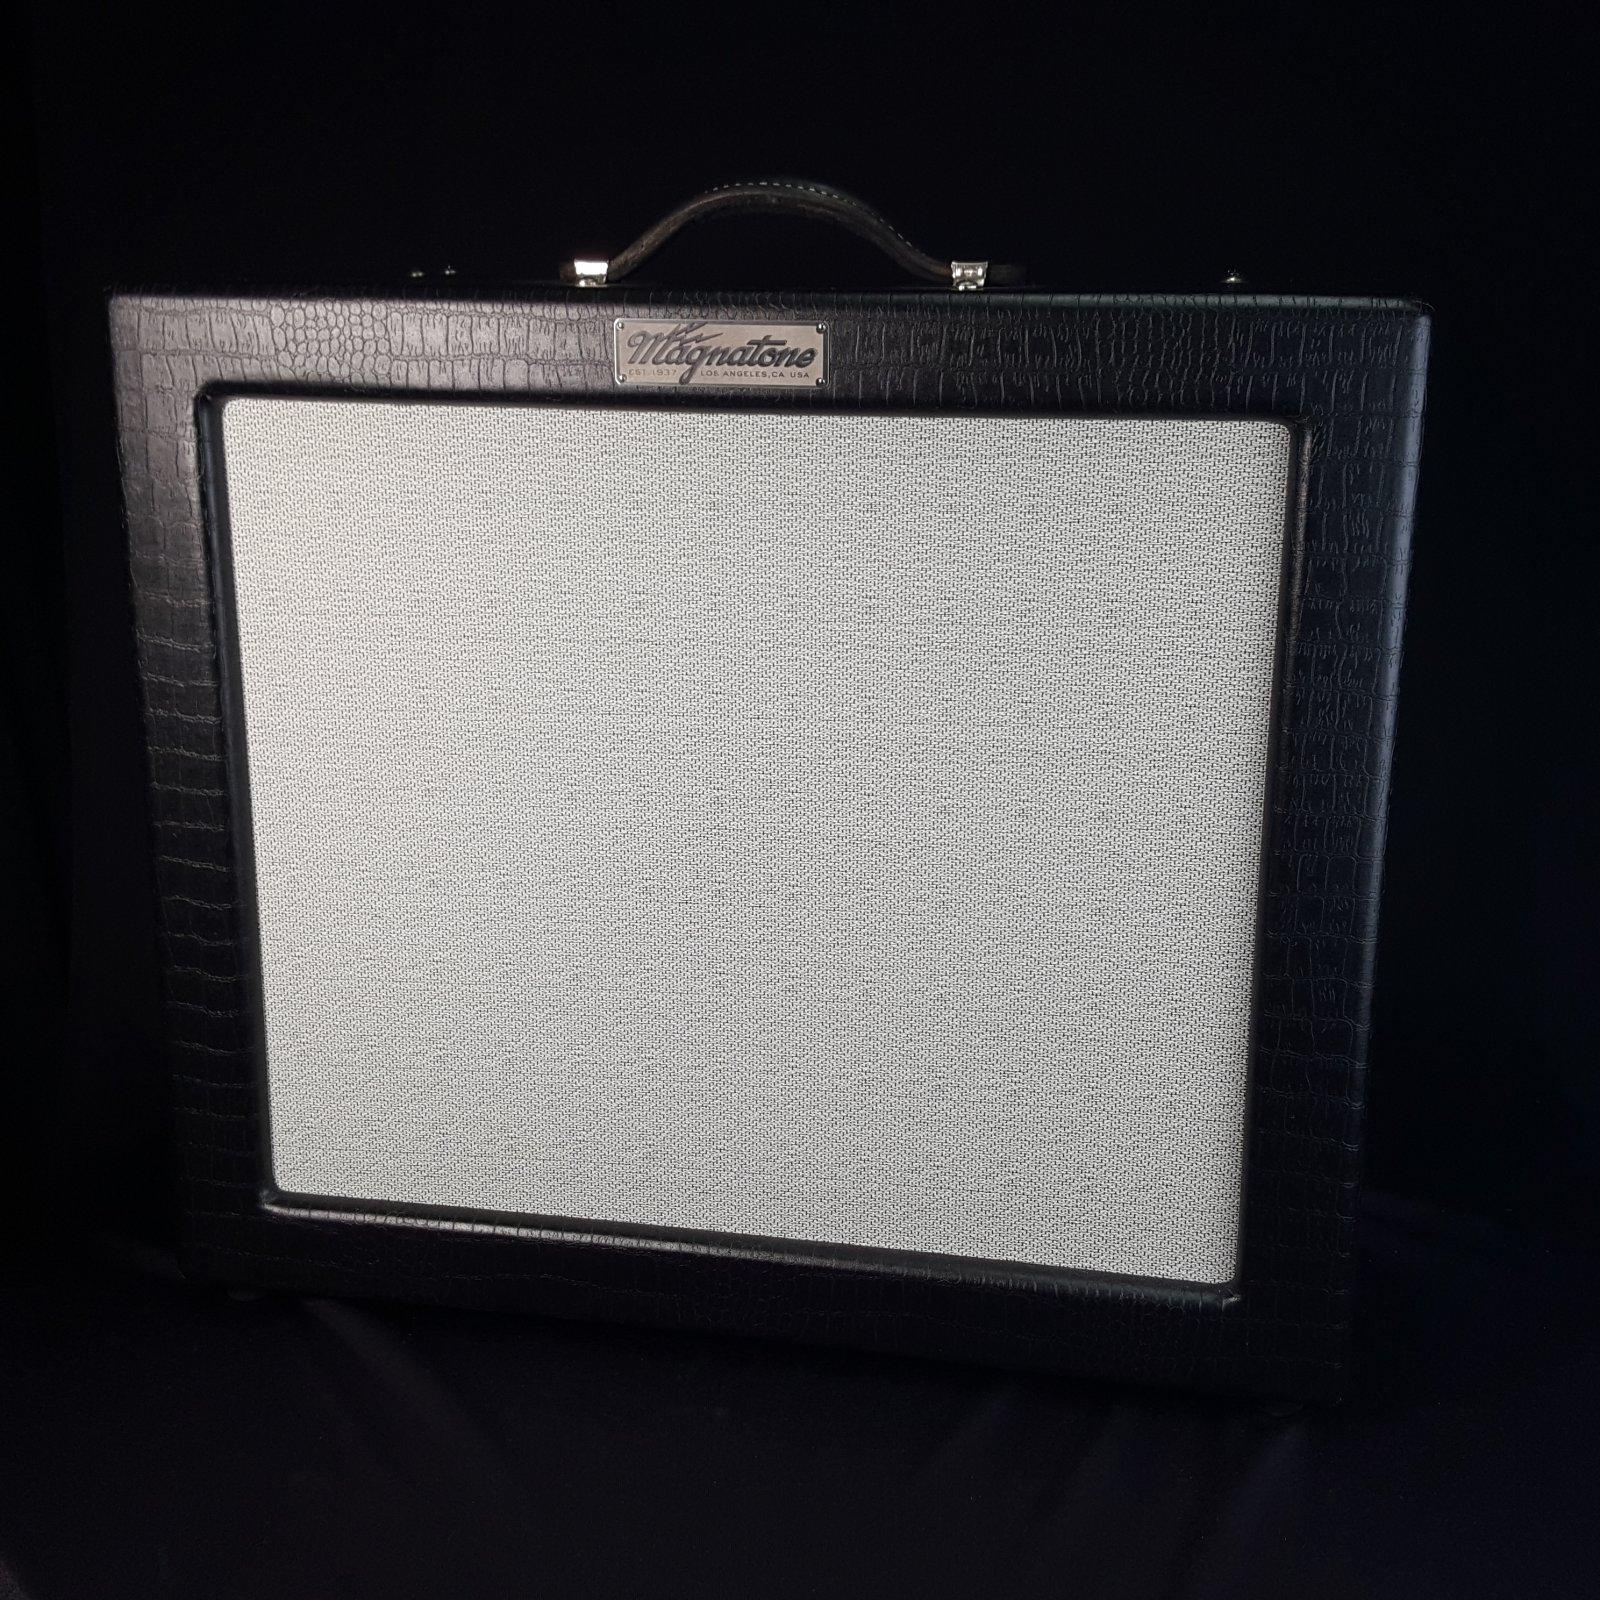 USED Magnatone Varsity Reverb Black Tolex TV Front amplifier w/ Cover